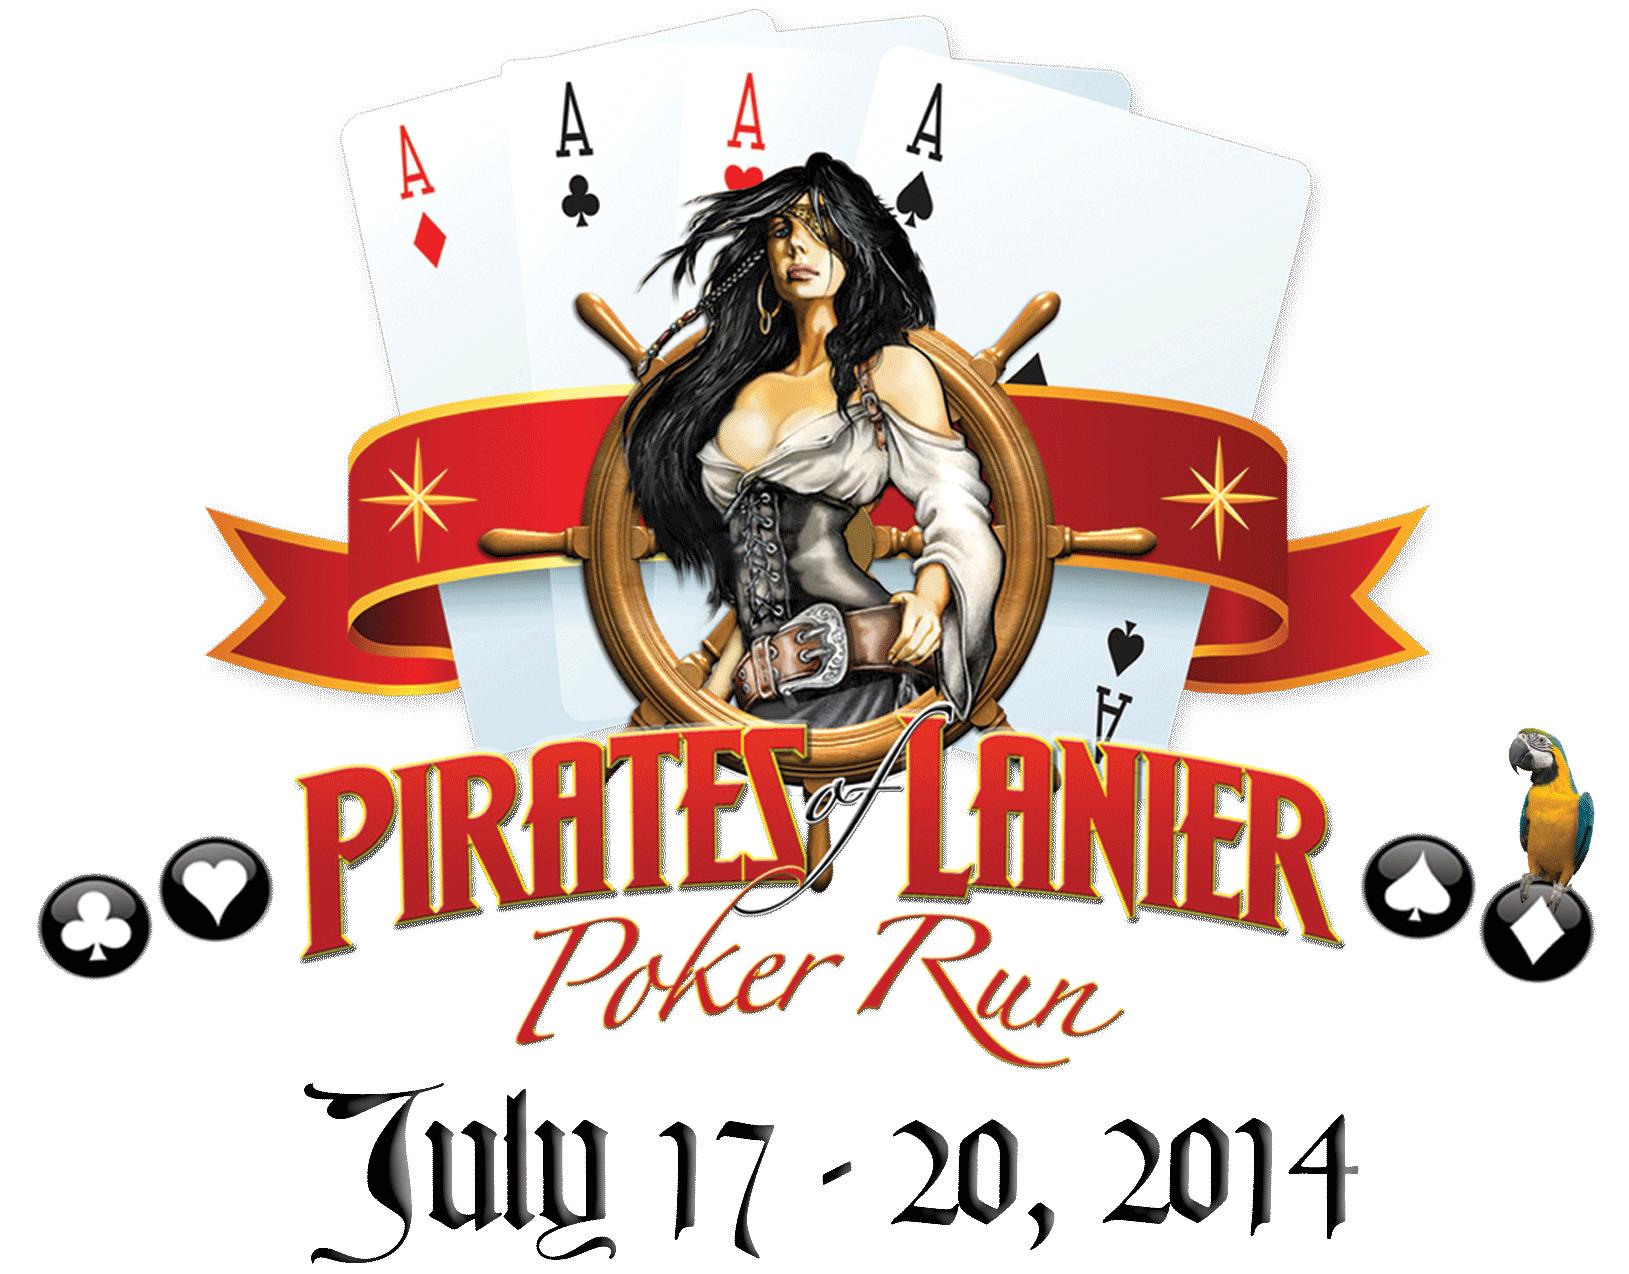 Lanier pirates poker run how to win slot machine scr888